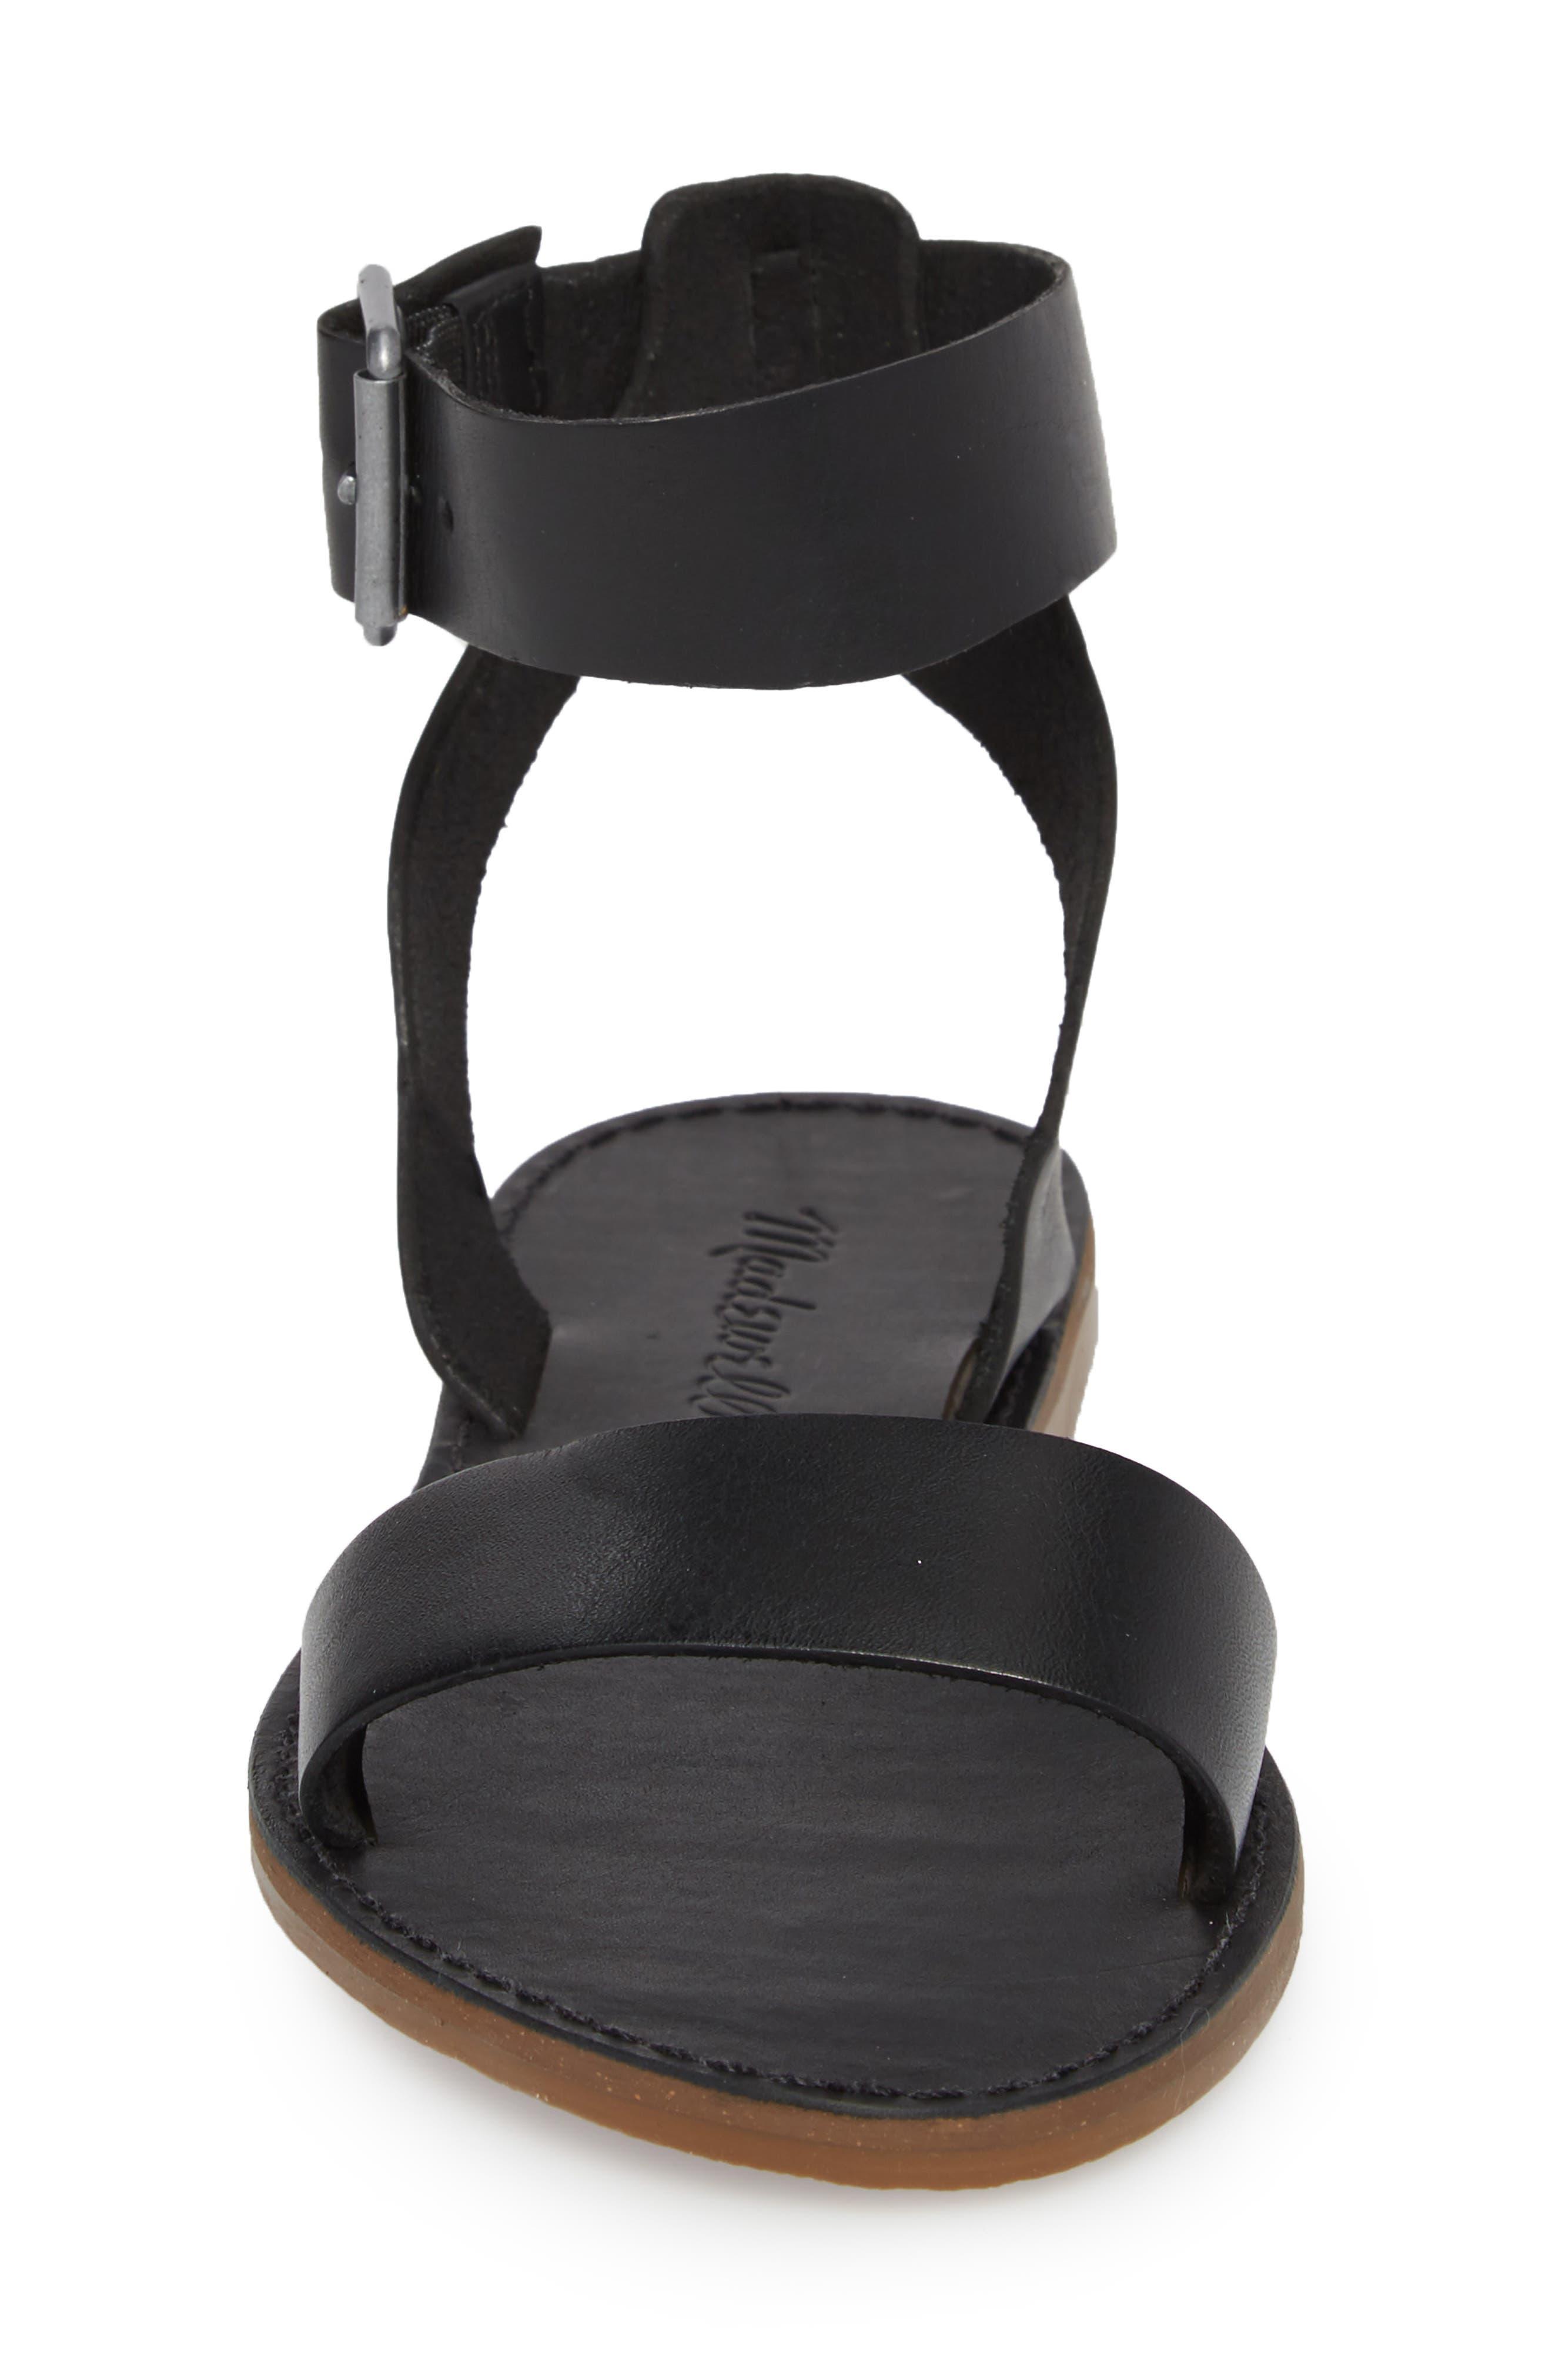 MADEWELL,                             The Boardwalk Ankle Strap Sandal,                             Alternate thumbnail 4, color,                             TRUE BLACK LEATHER